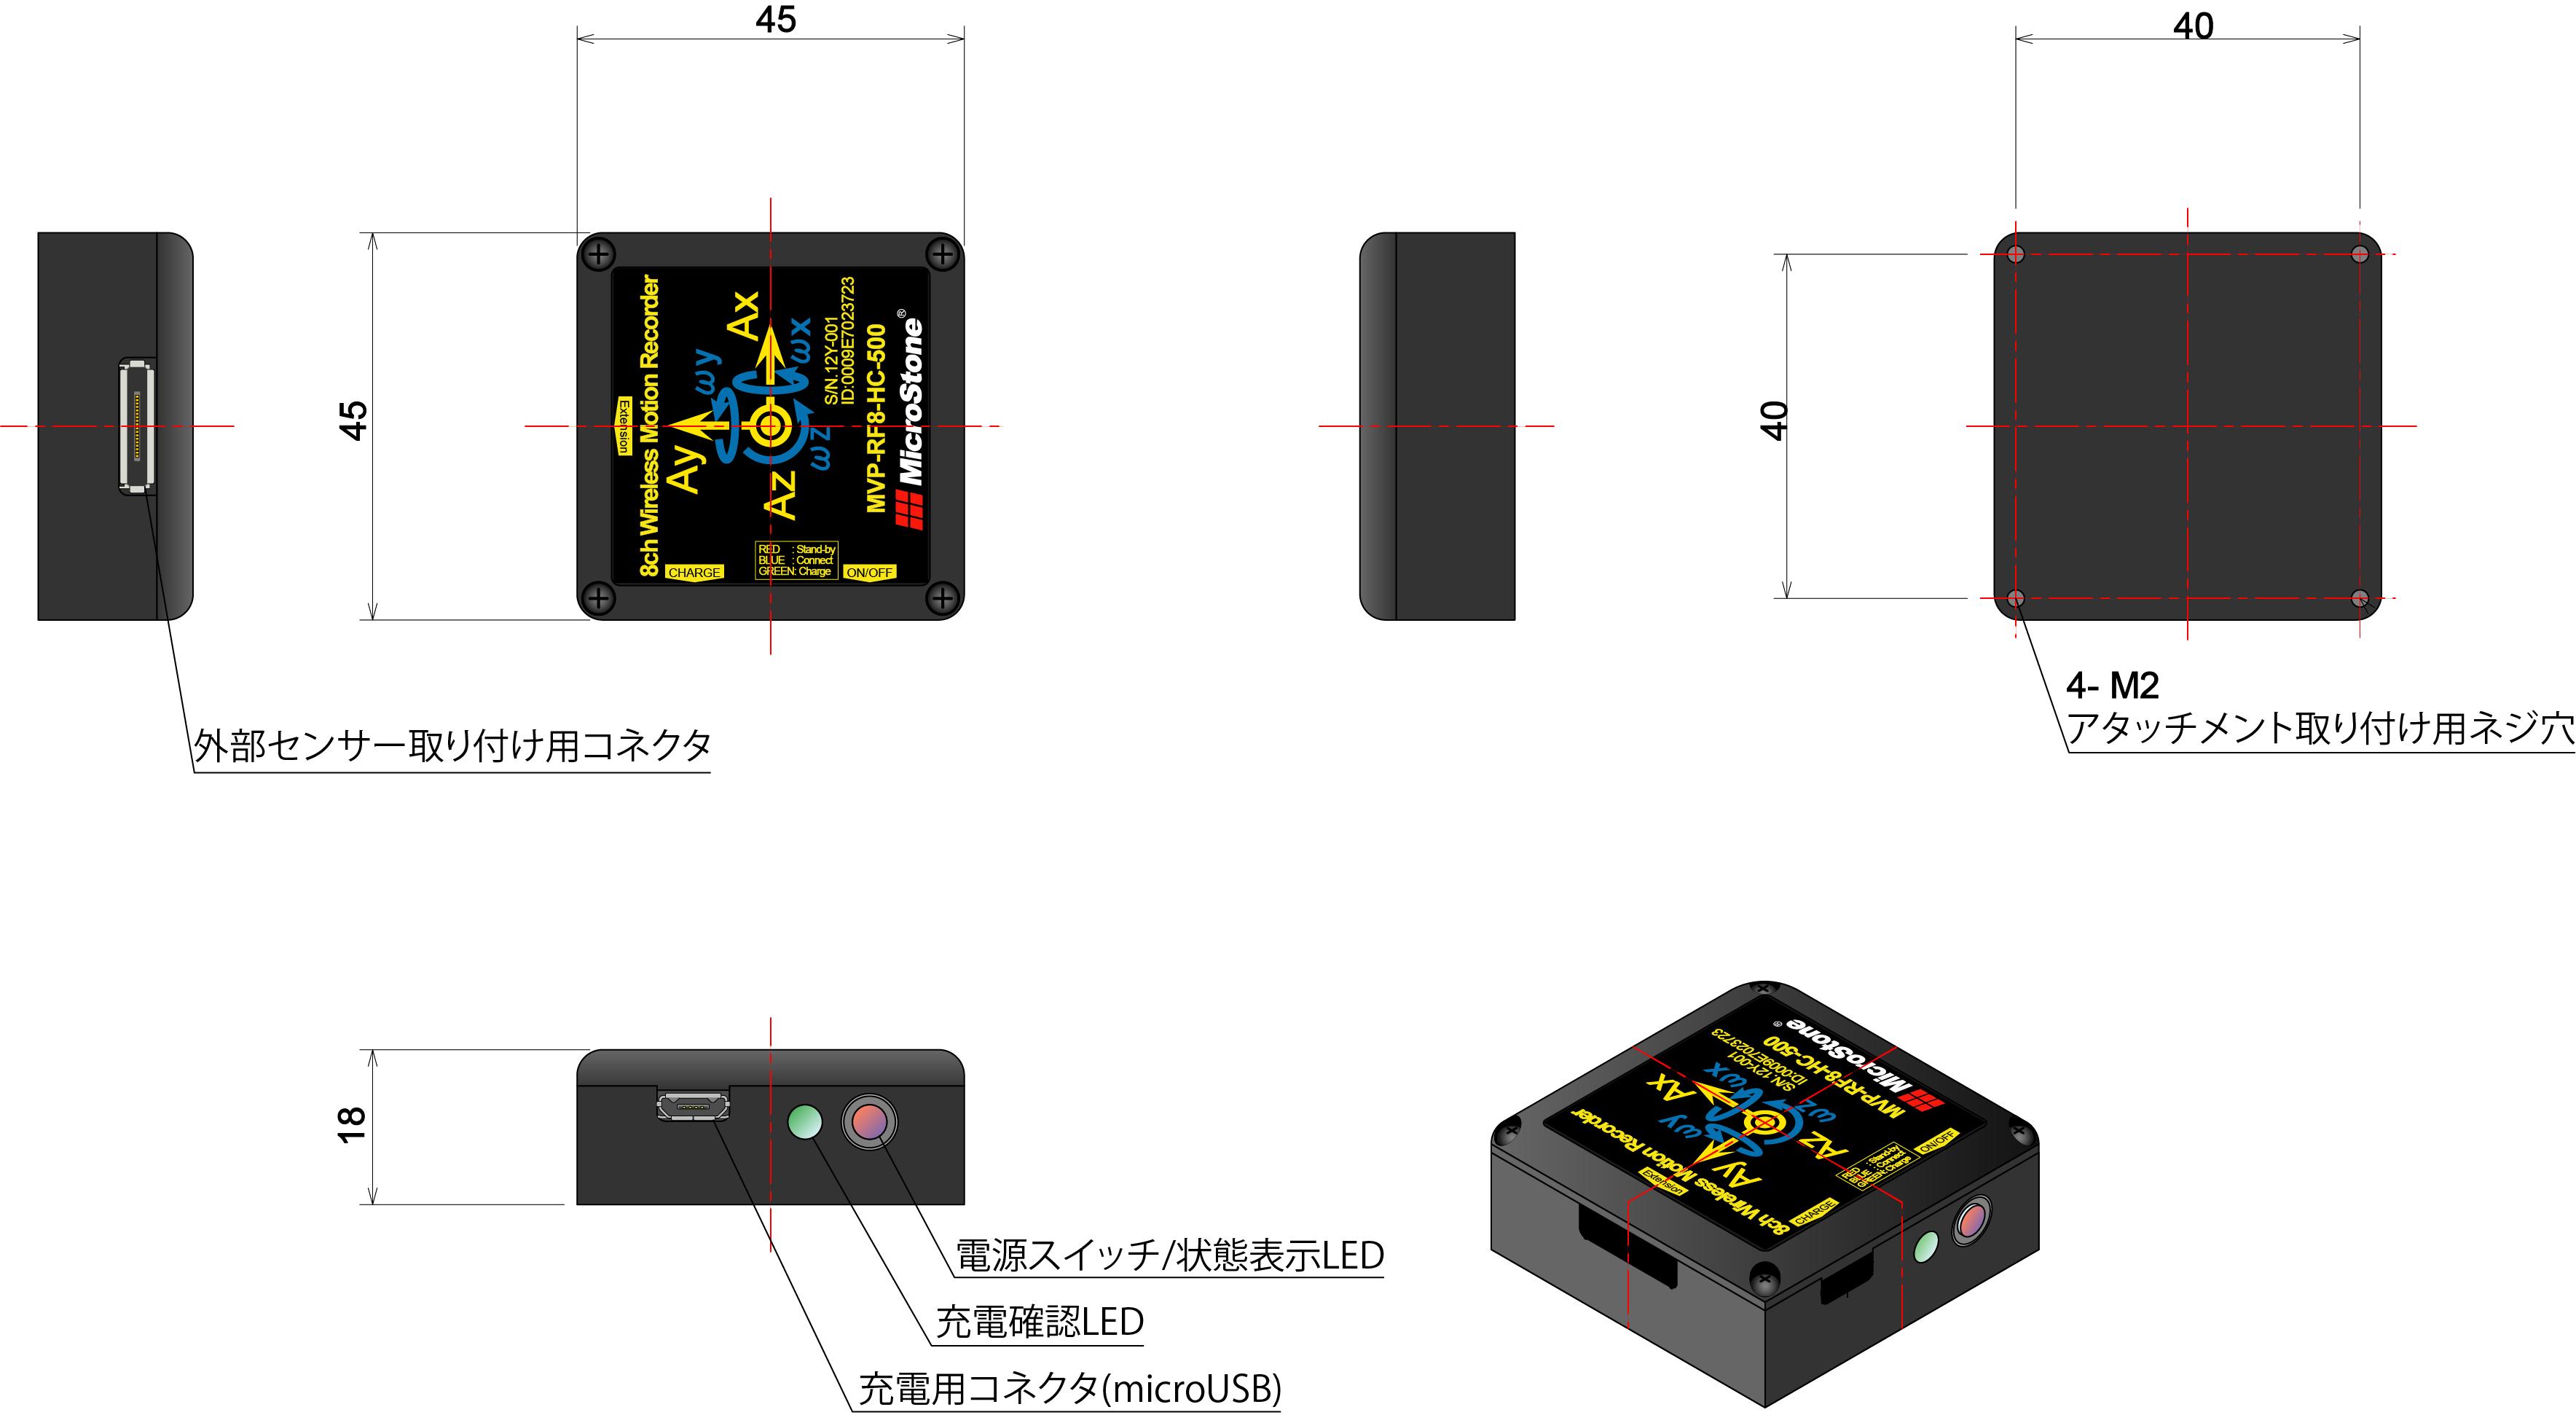 MVP-RF8-HC 外観説明